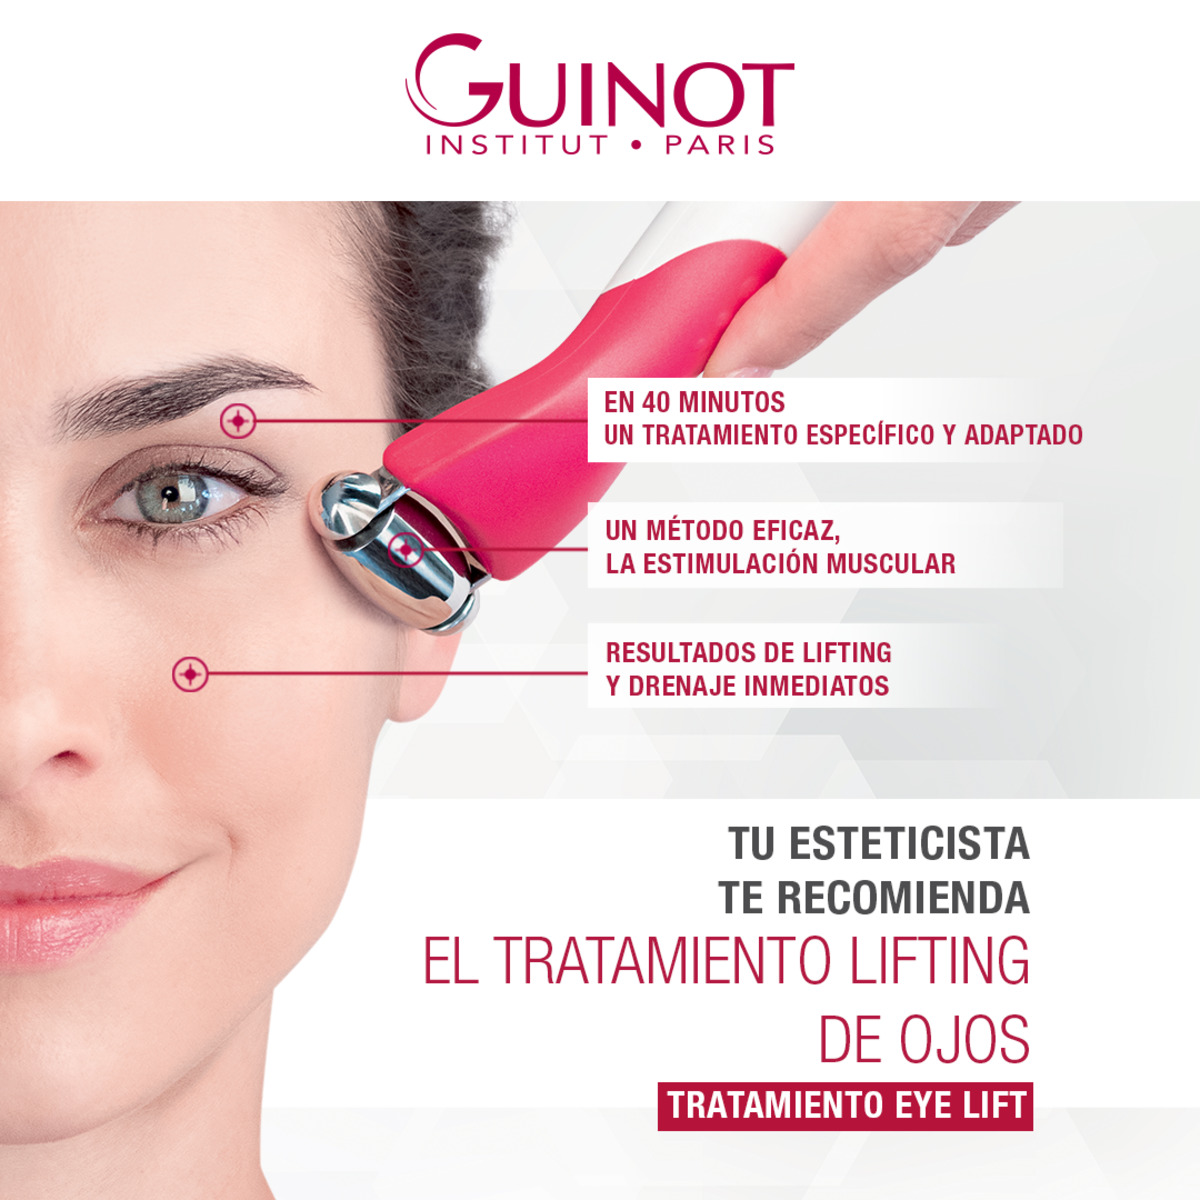 Tratamiento Lifting de Ojos Guinot - 1 Sesión